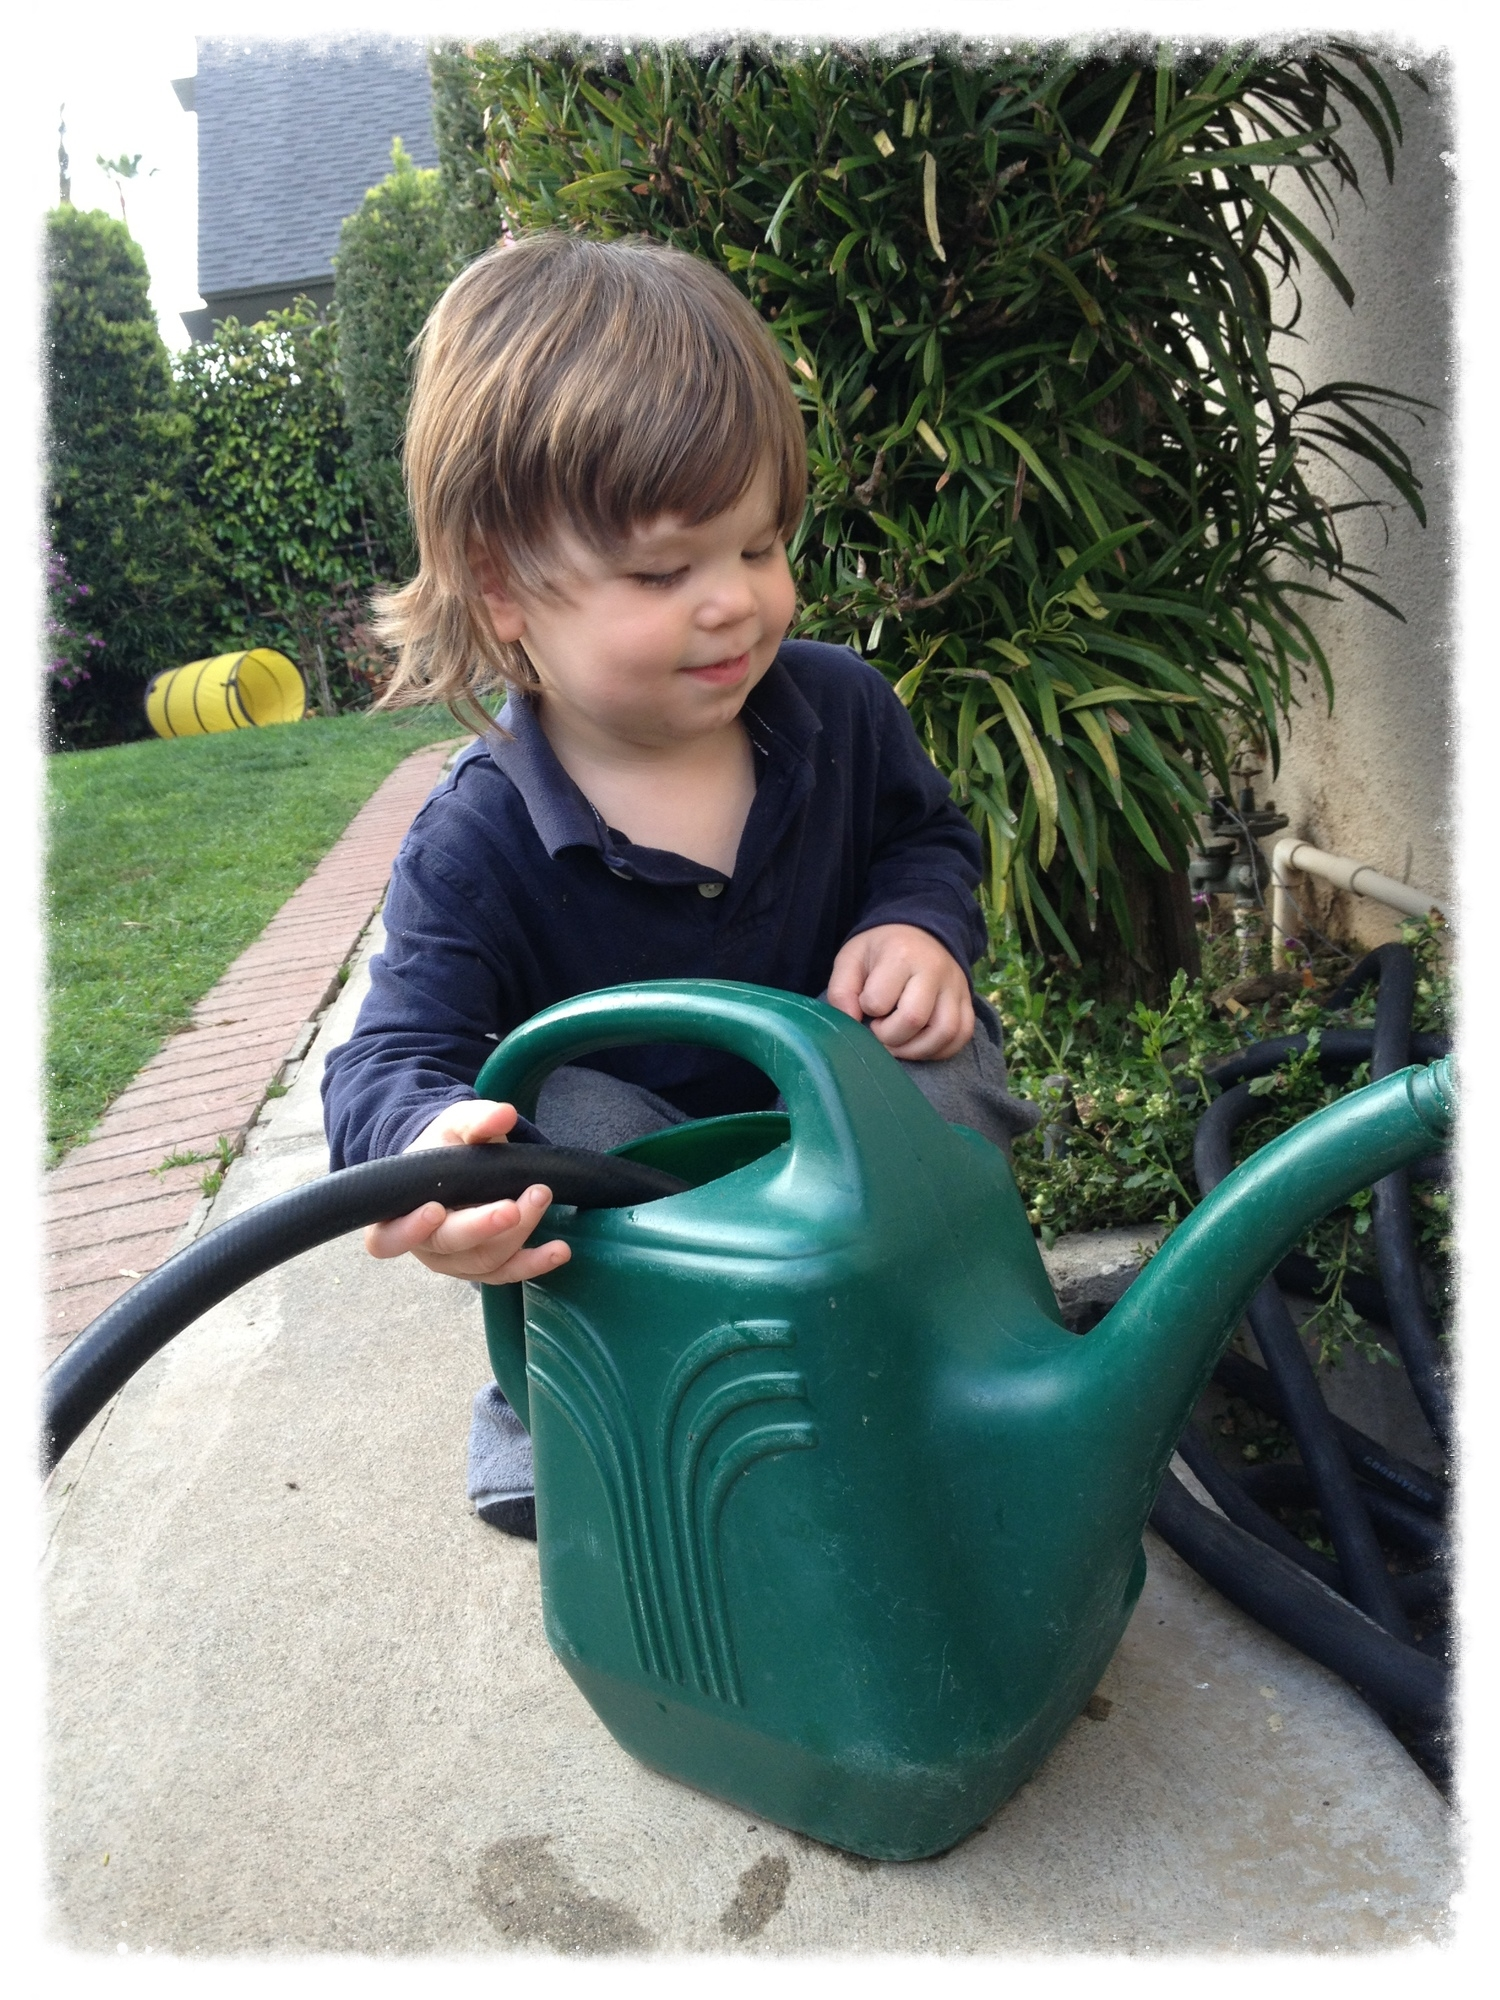 3 year old Darus partaking in one of his most favorite activities - watering!